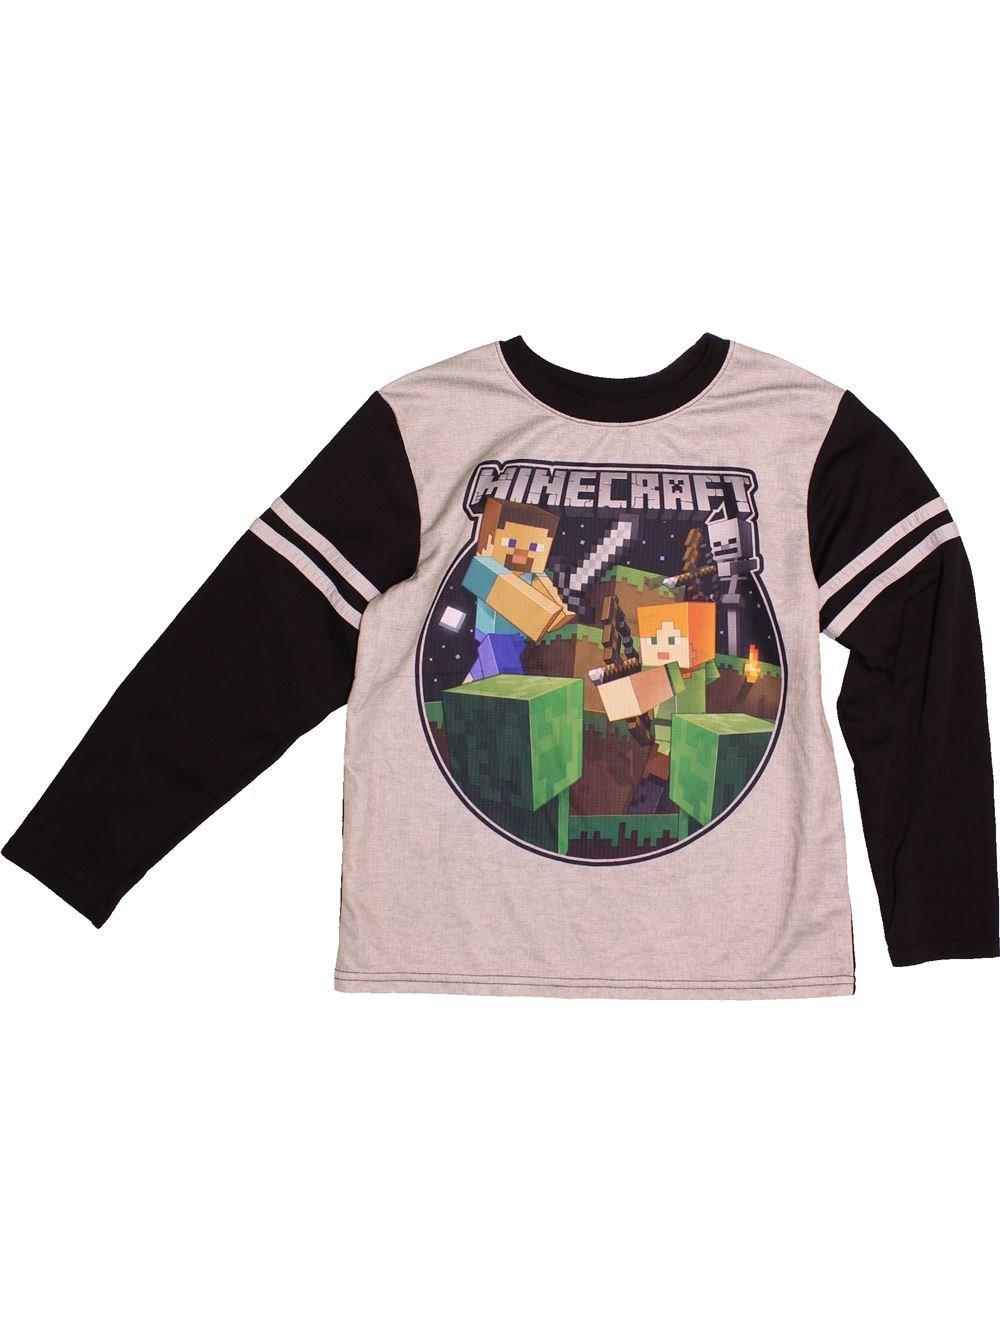 99 Minecraft Cher2 12 Manches Ans Pas Shirt Longues Garçon T rdshQt